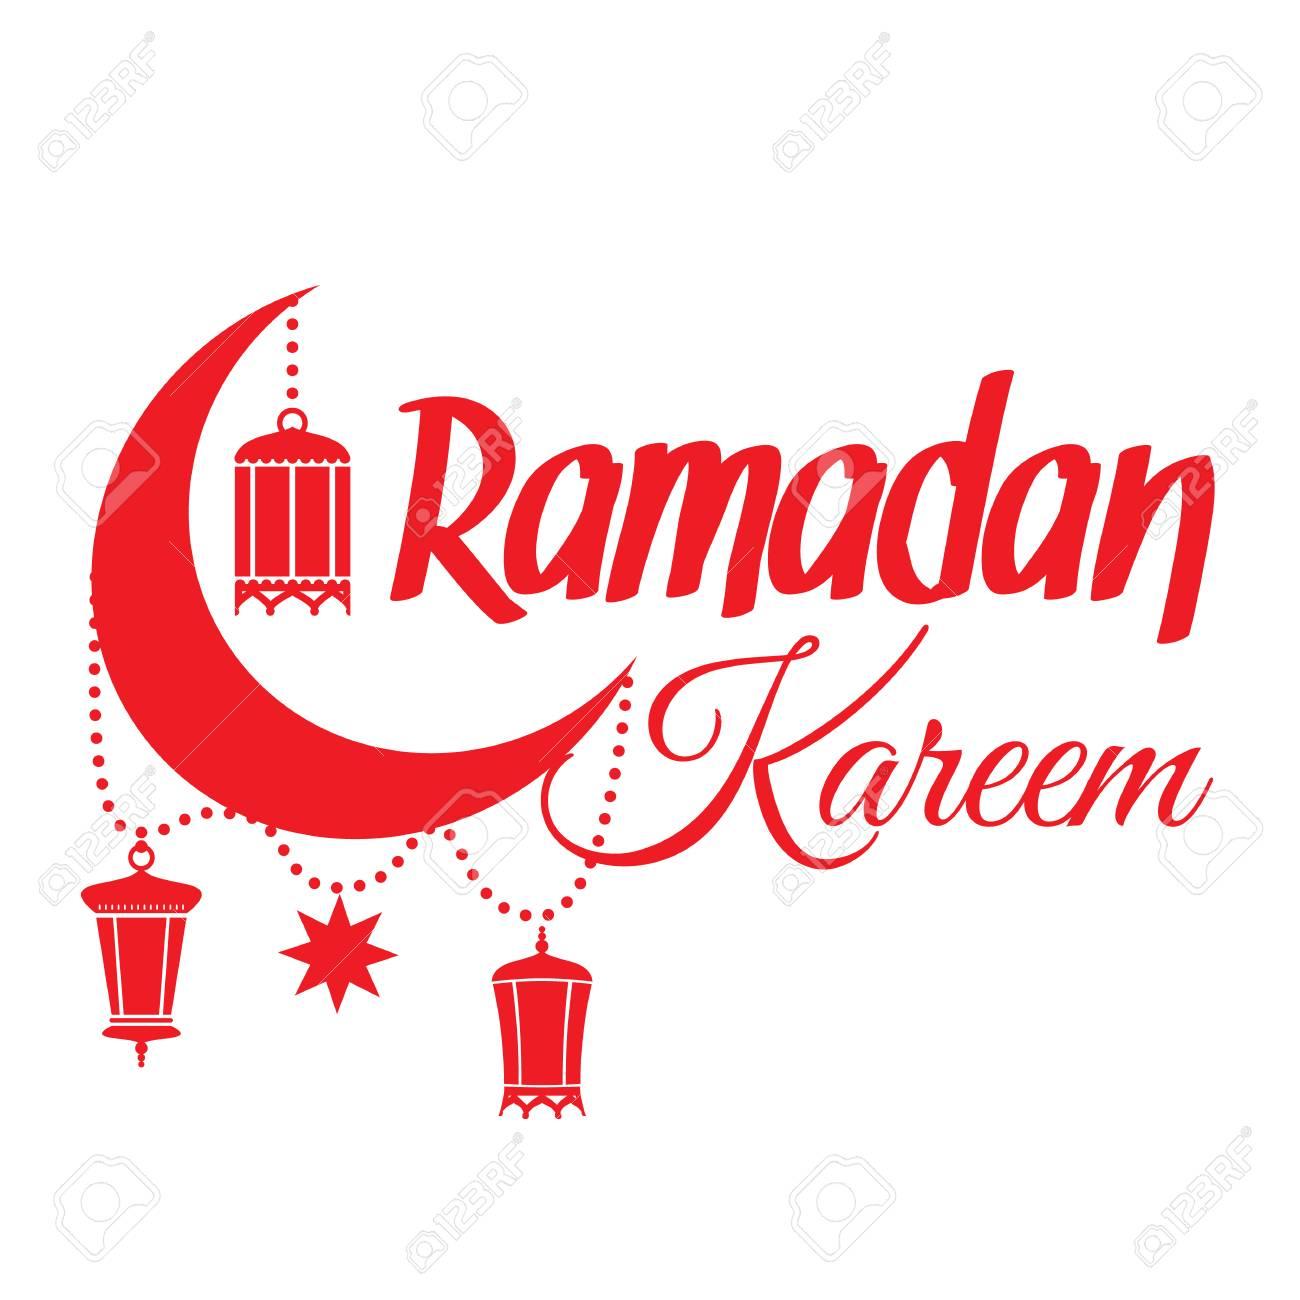 Ramadan kareem greeting card islamic crescent moon and lantern ramadan kareem greeting card islamic crescent moon and lantern lamps illustration for muslim holy m4hsunfo